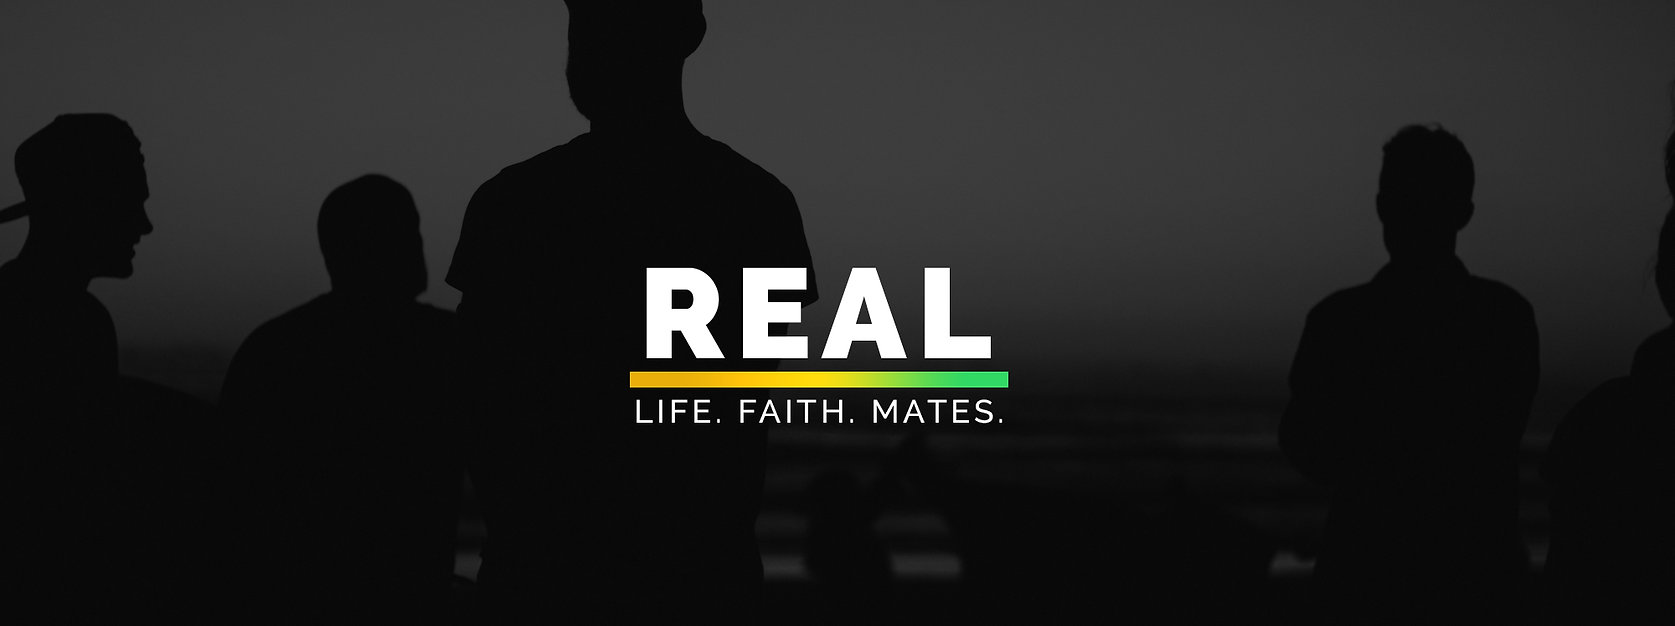 REALmenwebsite-banner.jpg